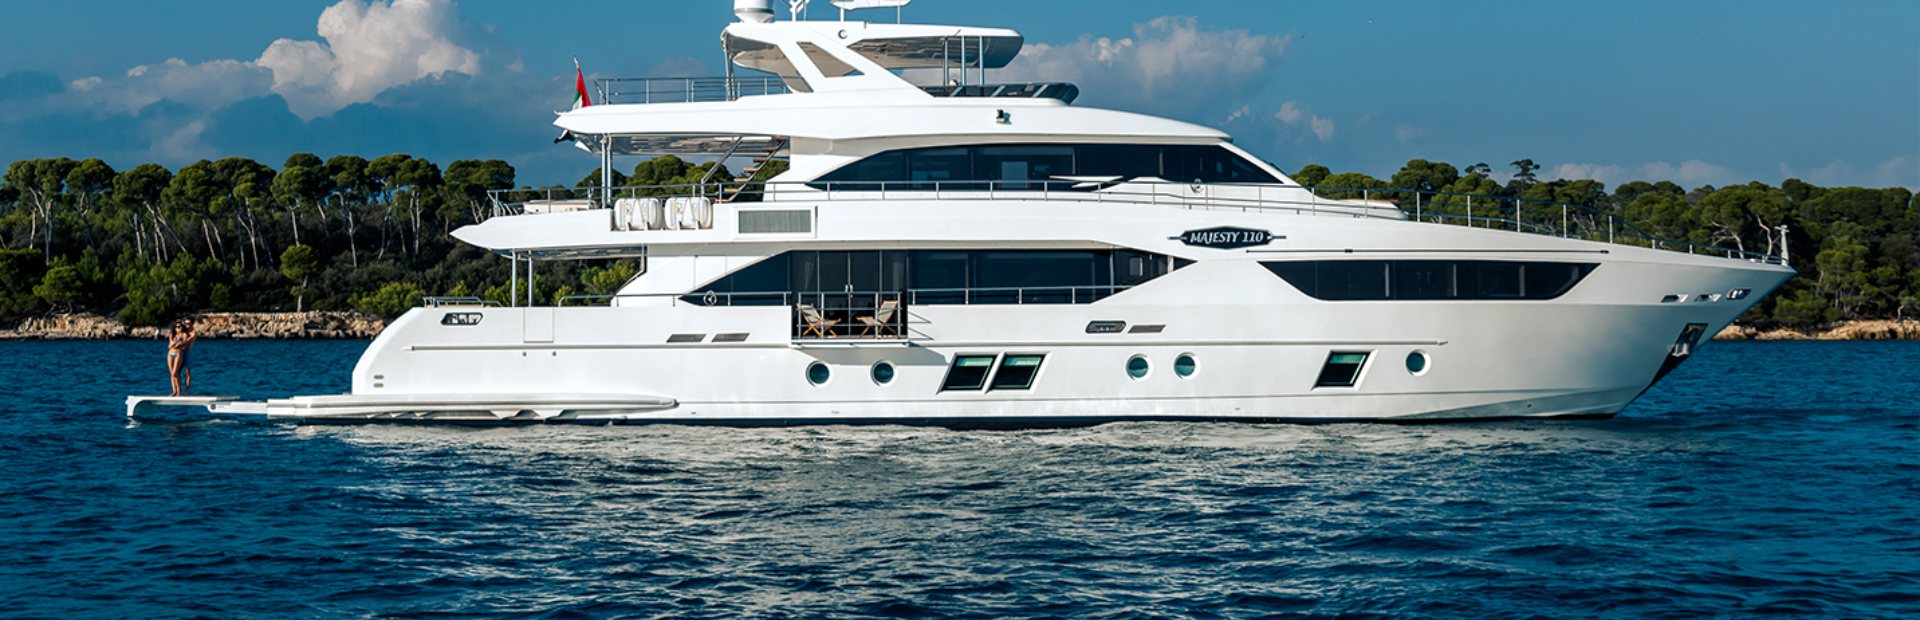 Majesty 110 Yacht Charter